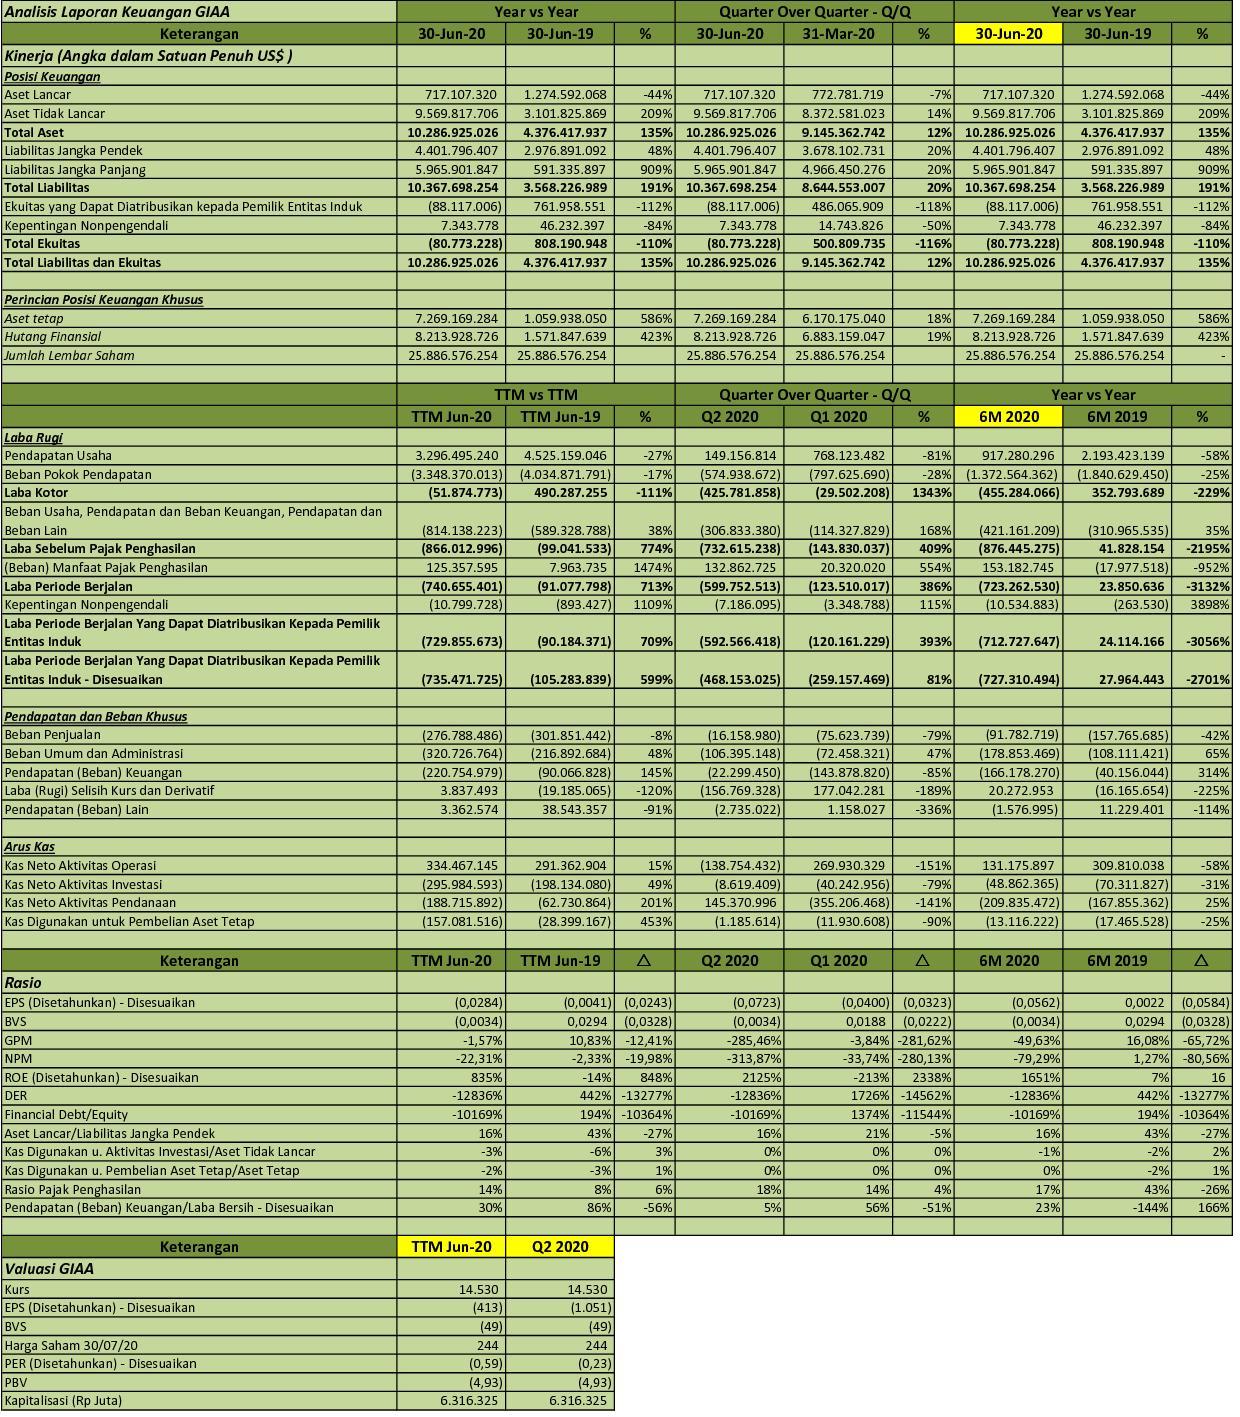 Idx Investor Giaa Q2 2020 Garuda Indonesia Persero Tbk Analisis Laporan Keuangan